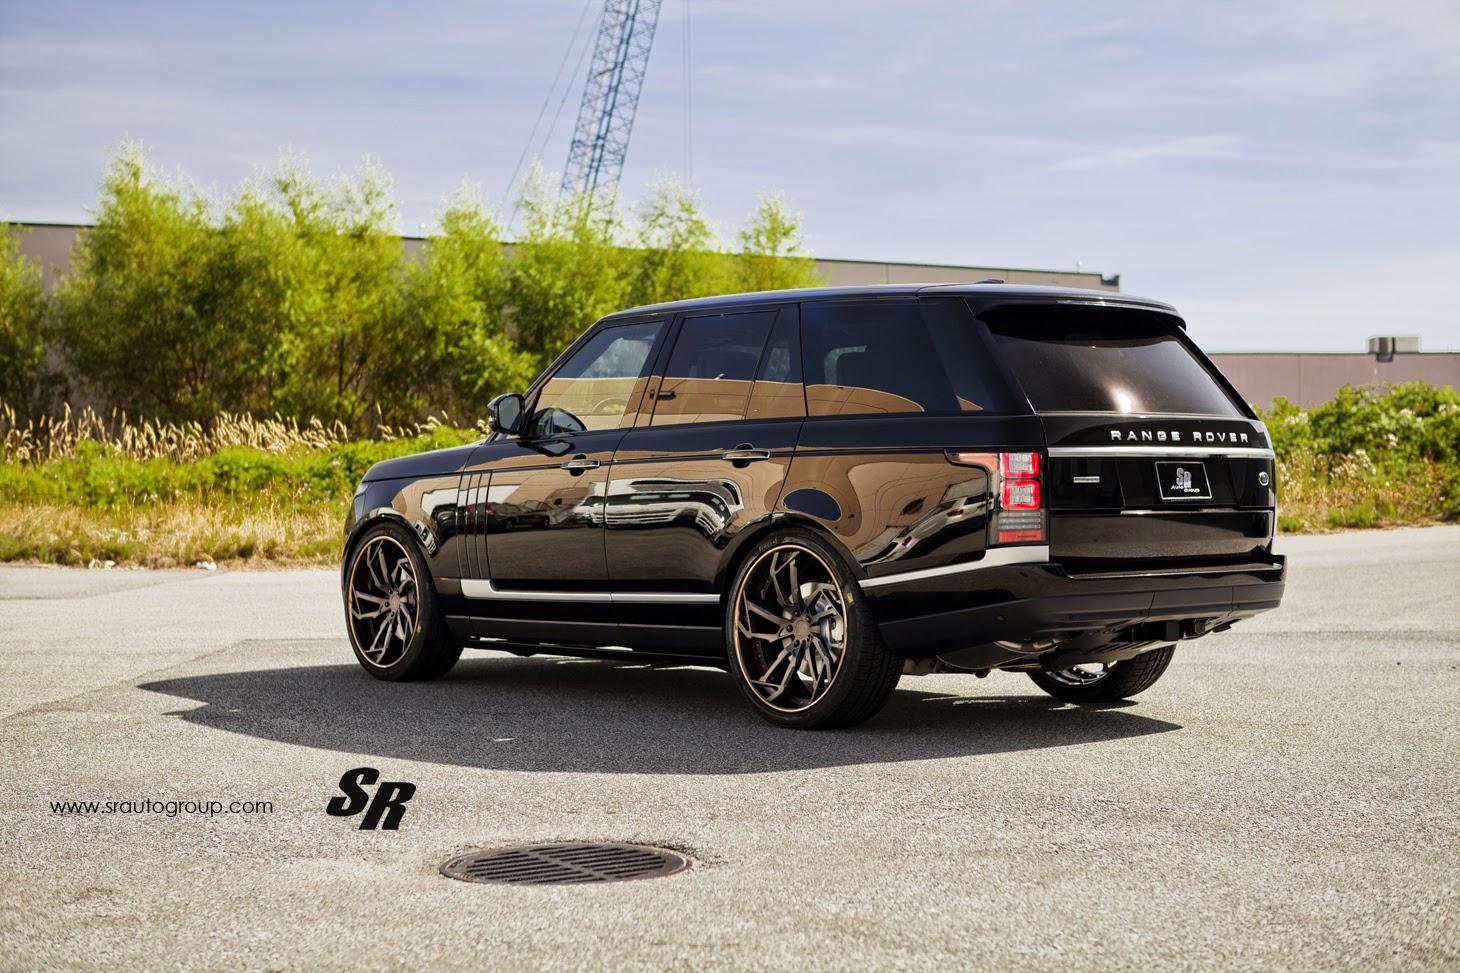 Range Rover Matte Black >> Range Rover Autobiography Gets Some Big New PUR Wheels